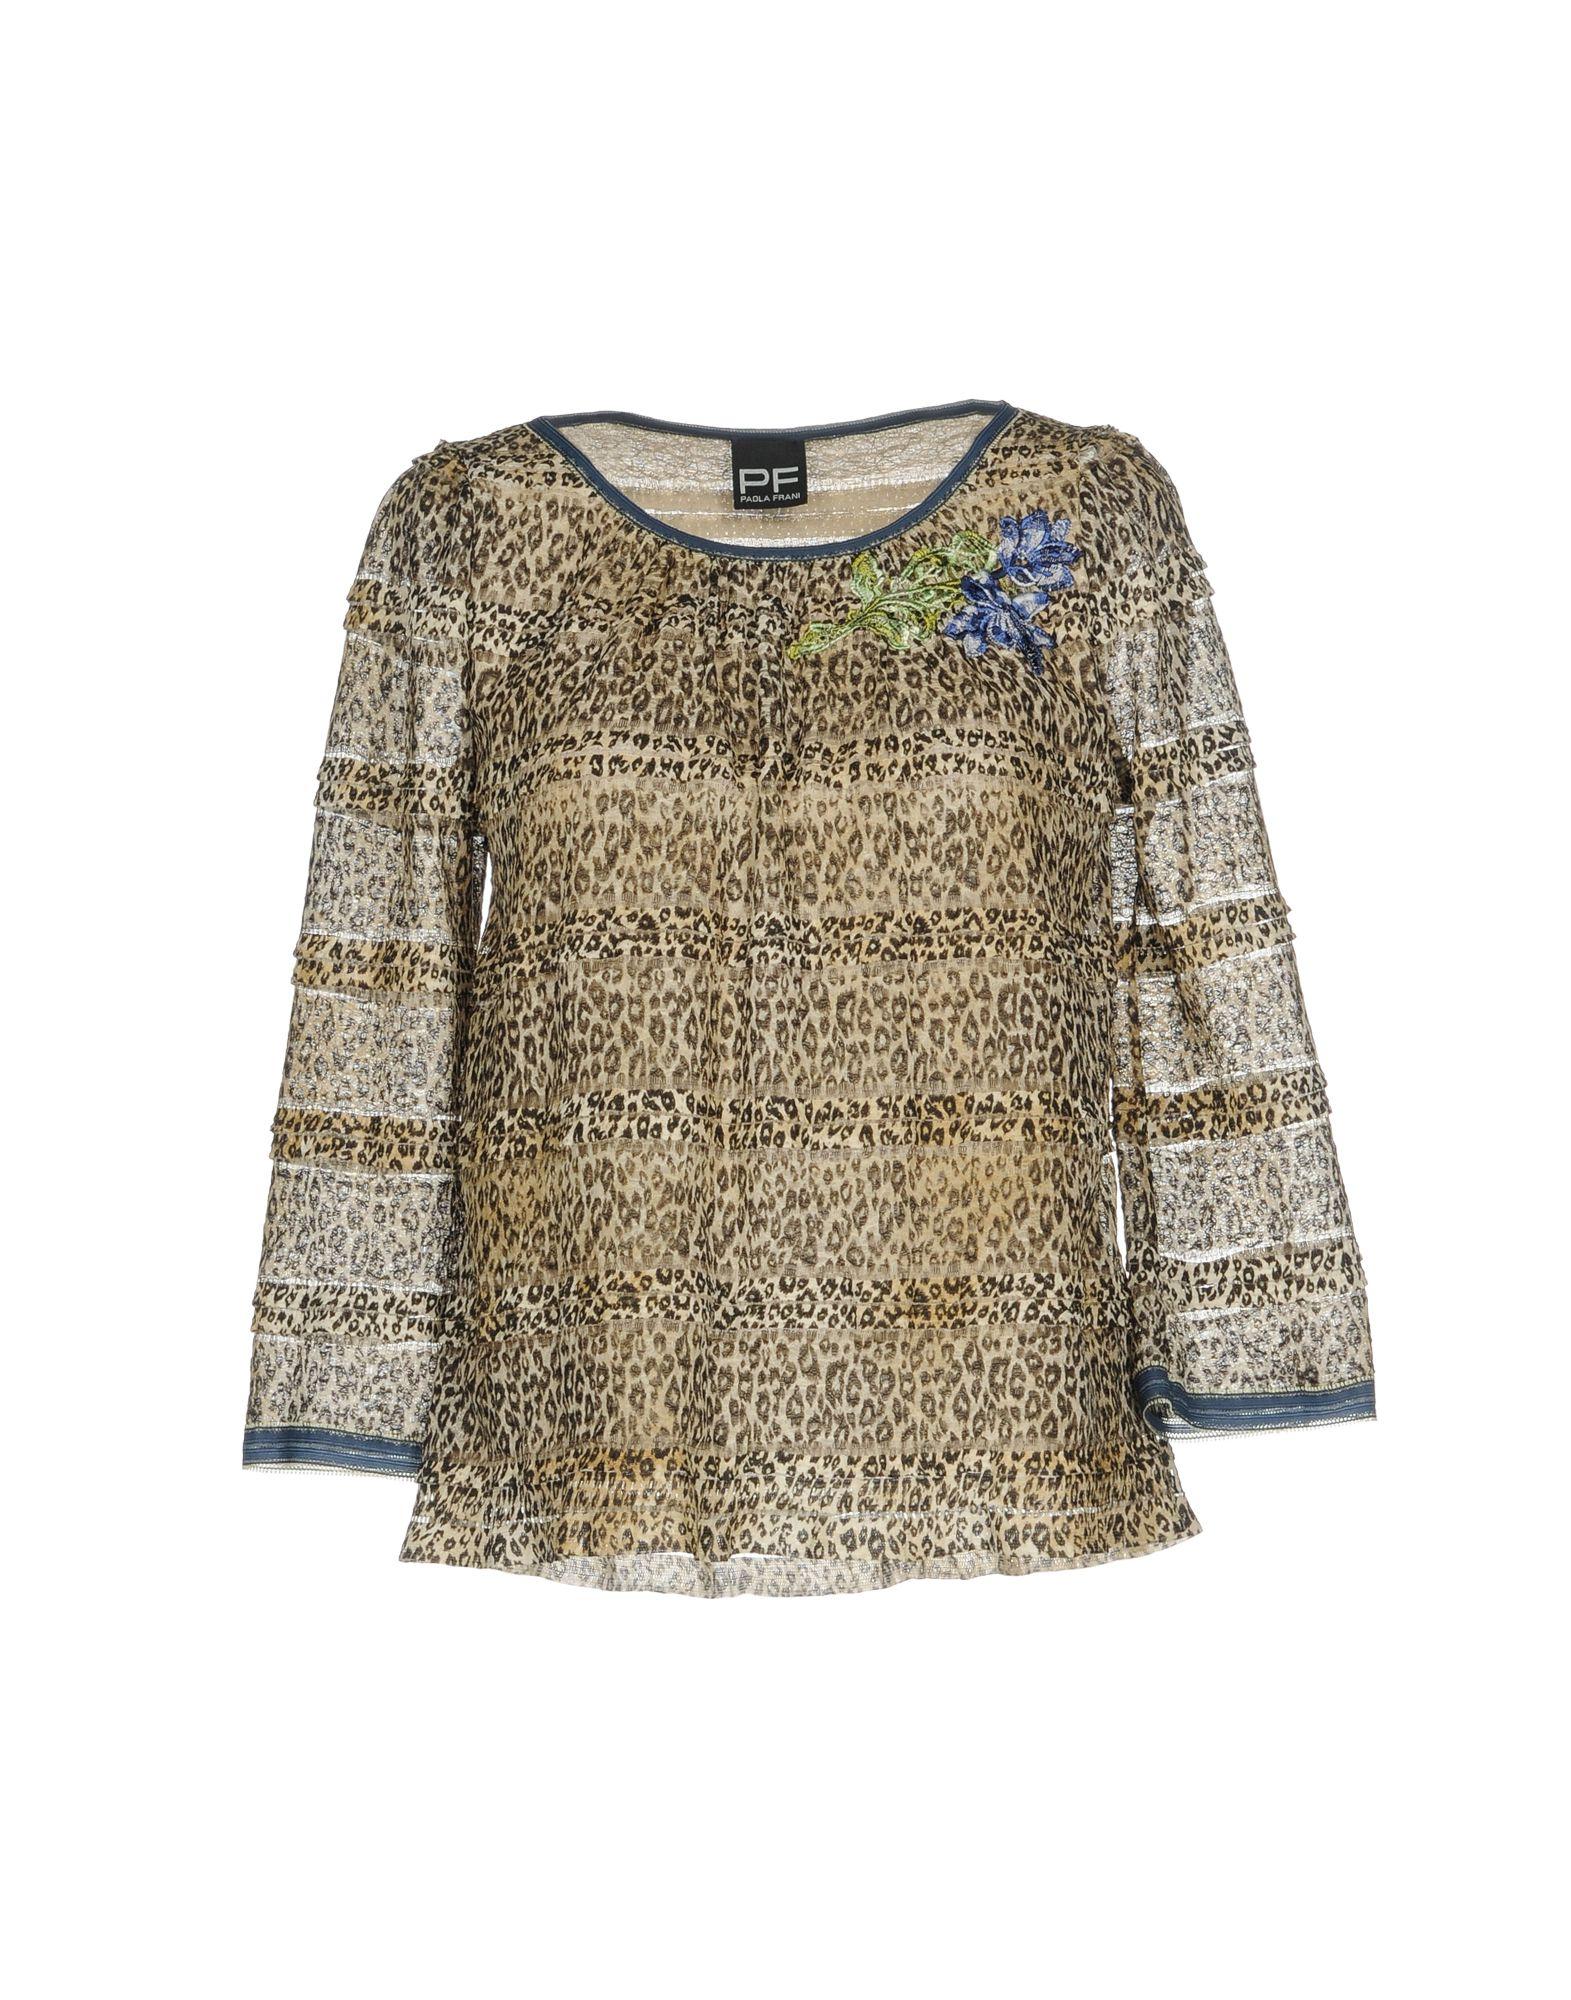 PF PAOLA FRANI Блузка блузка paola klingel цвет фиолетовый рисунок